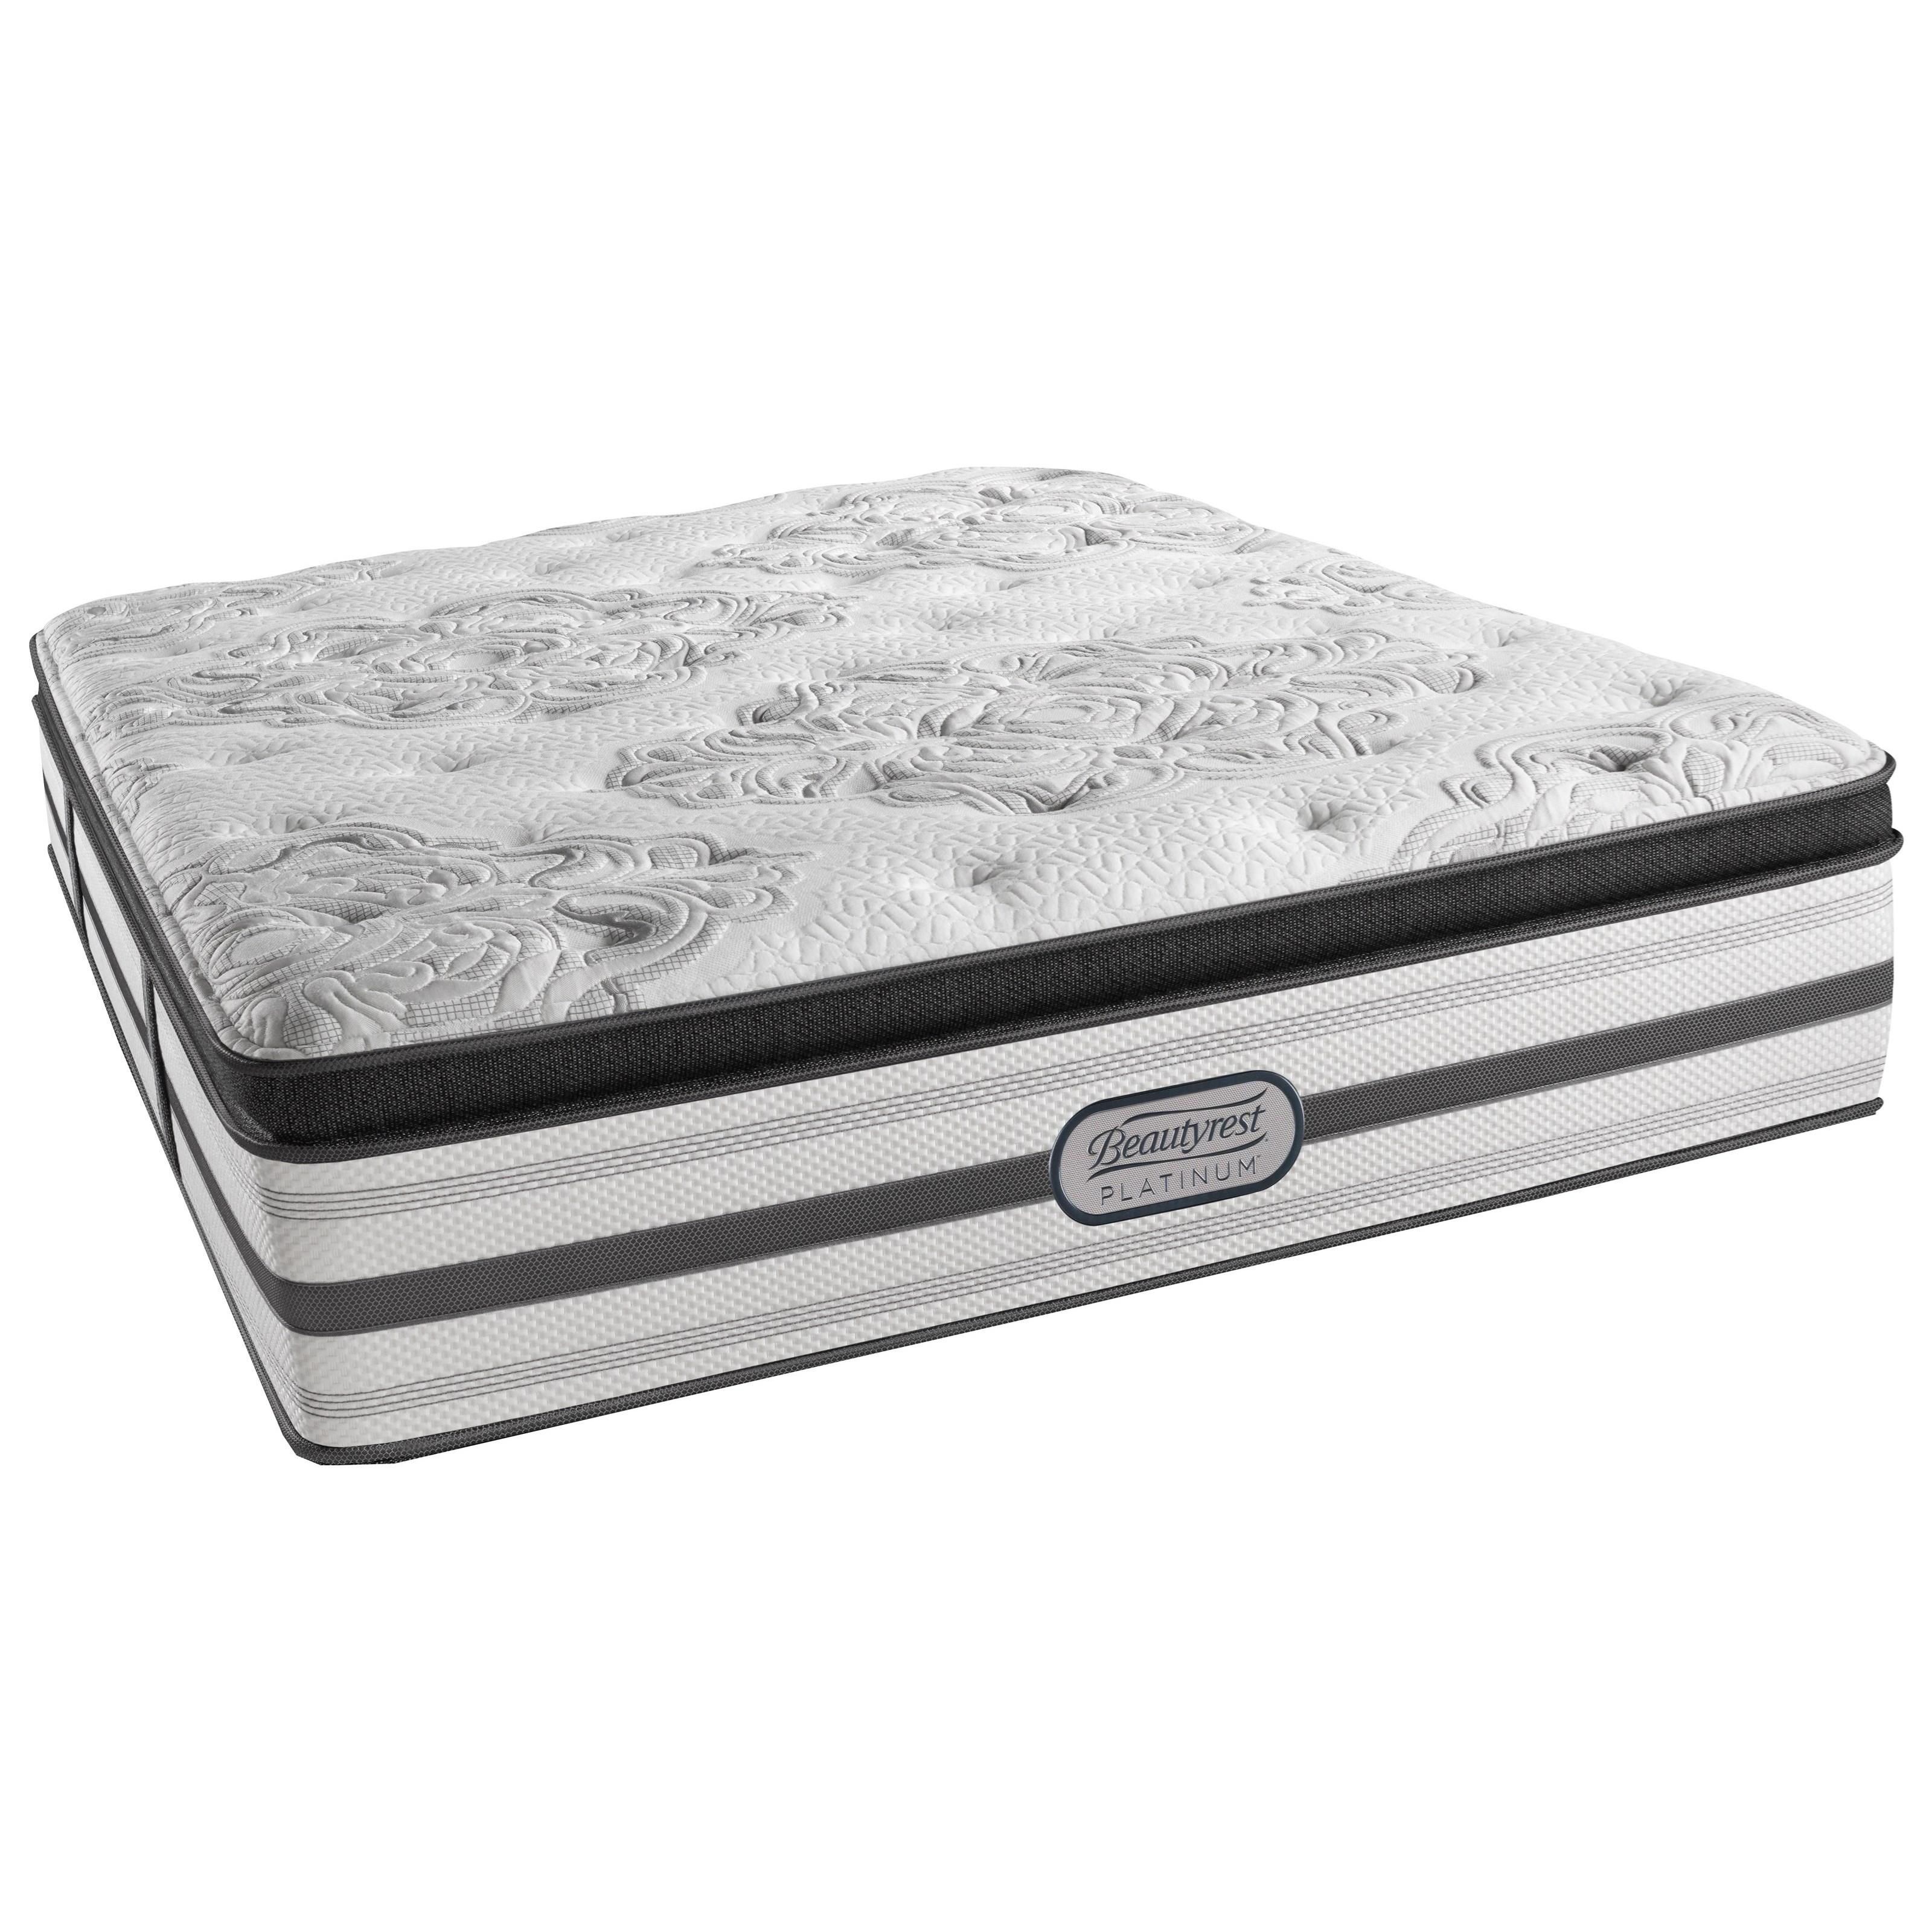 Beautyrest Platinum Gabriella Twin Plush Pillow Top Mattress - Item Number: LV3PLPT-T